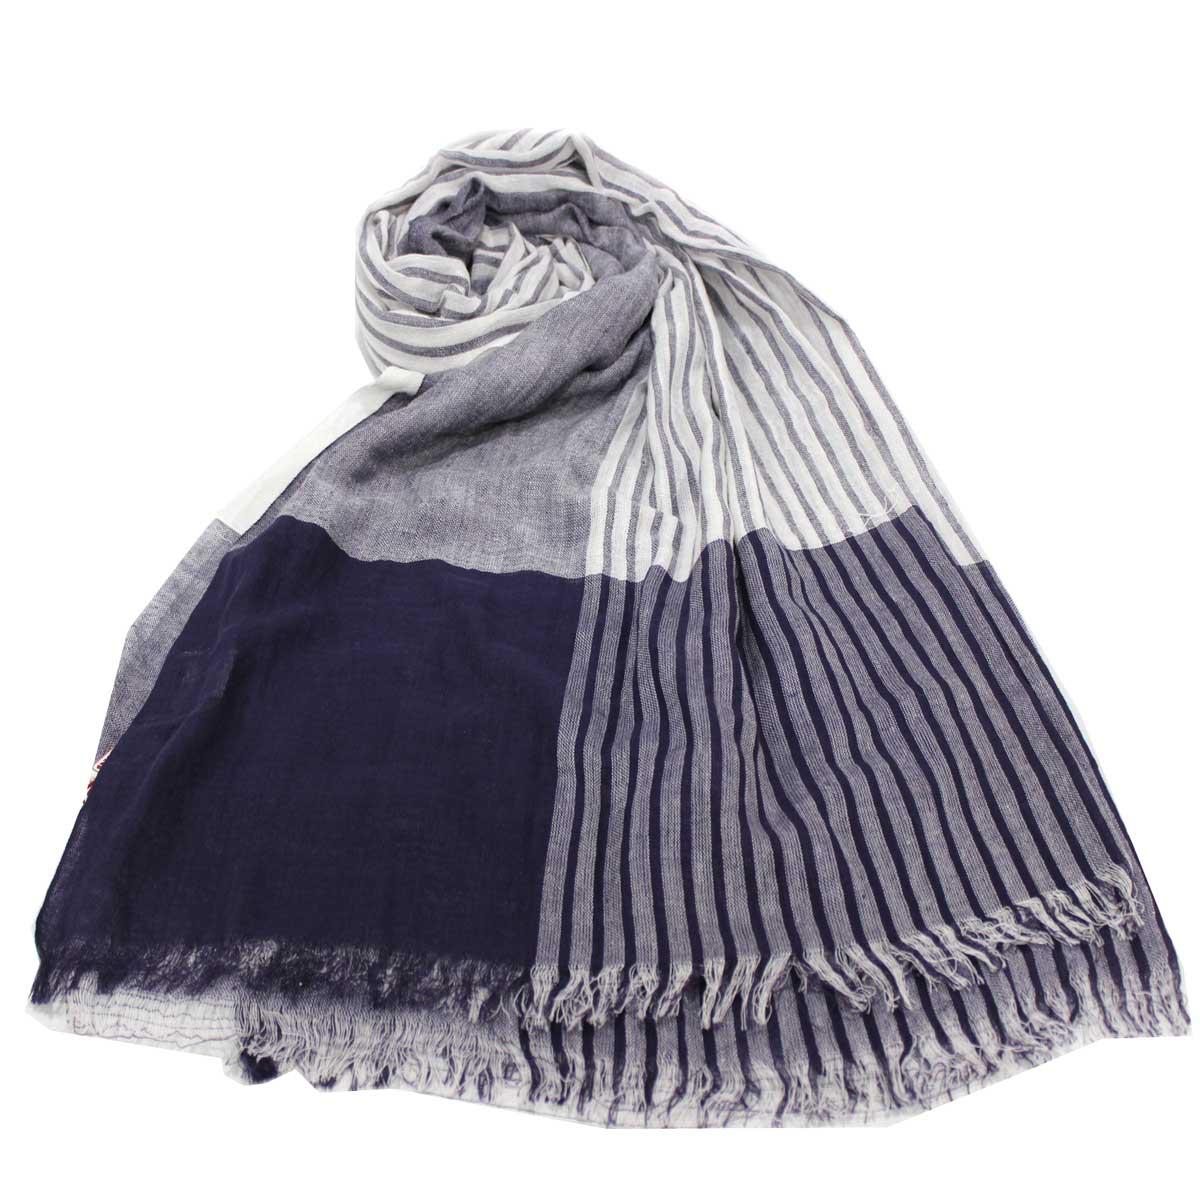 nuovo stile 78823 c2eba Sciarpa unisex uomo donna 100% cotone pashmina sfrangiata estiva 200x100 blu